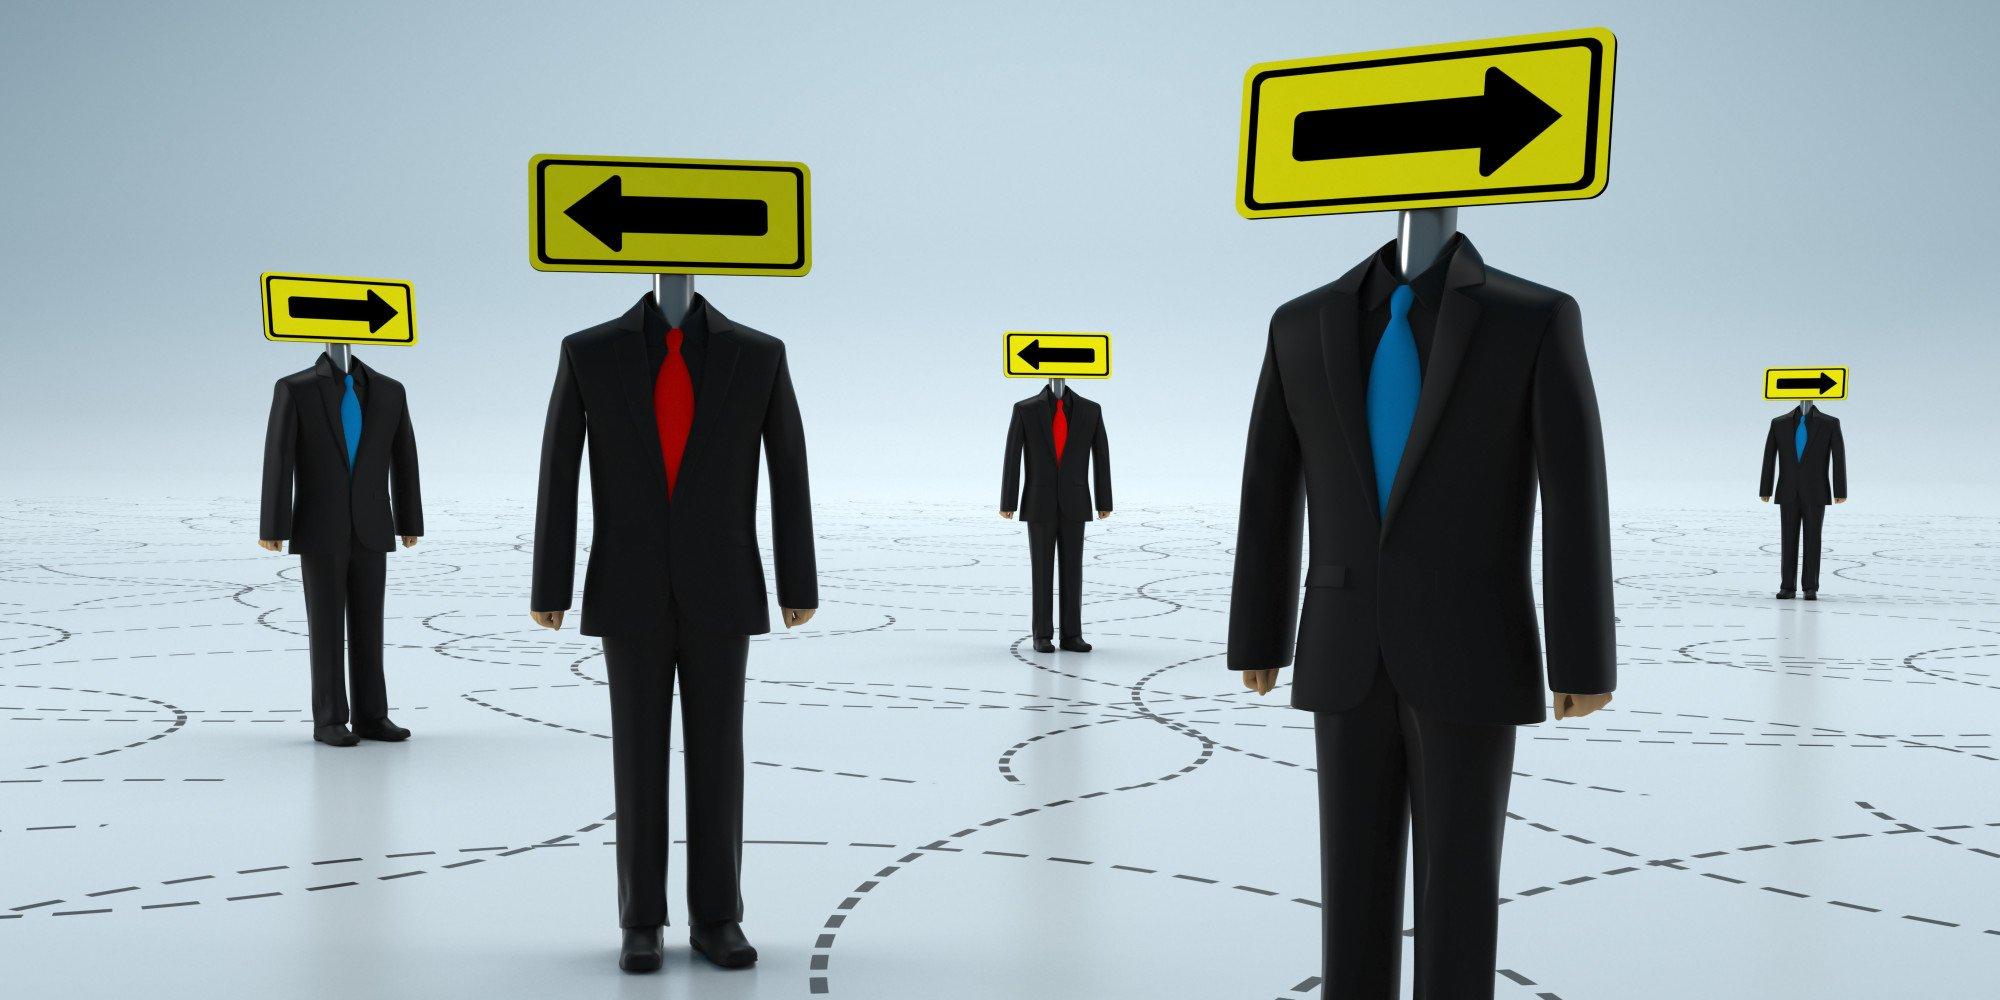 Syarat mutasi karyawan sesuai uu ketenagakerjaan